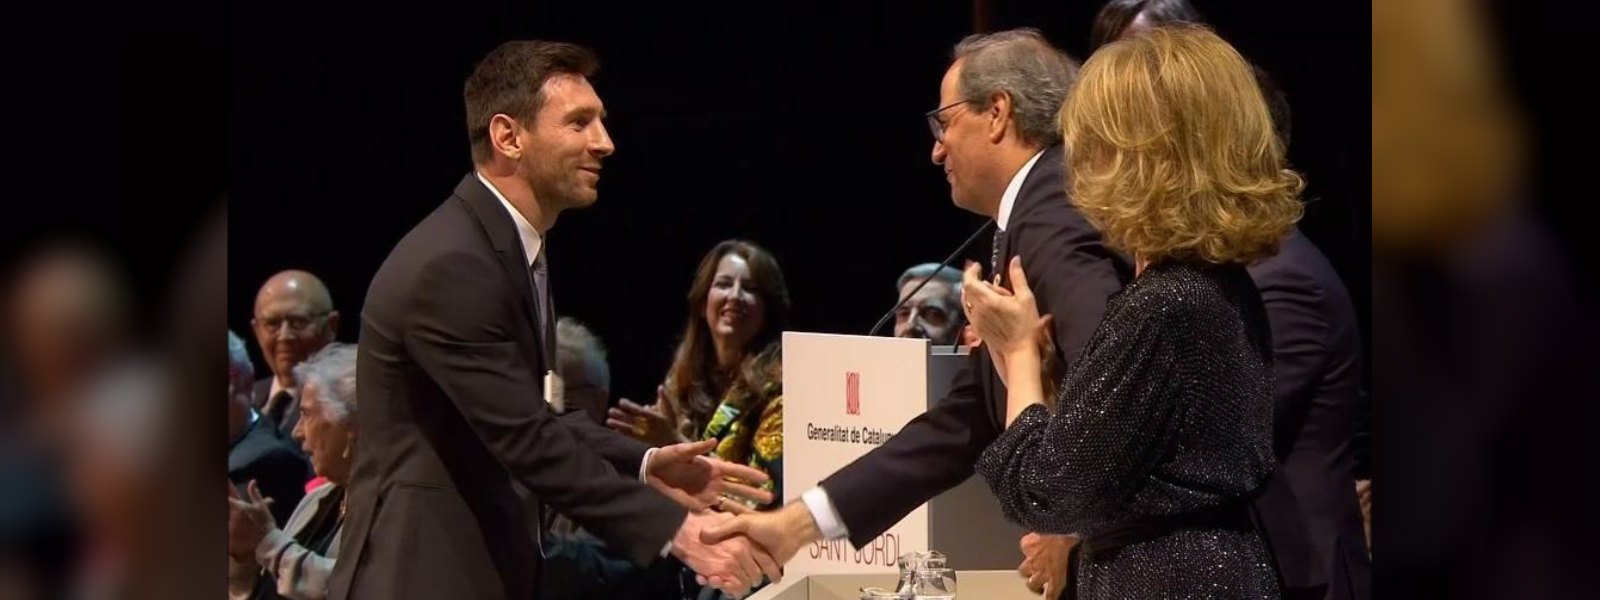 Barcelona superstar Messi awarded Catalan Creu de Sant Jordi honour